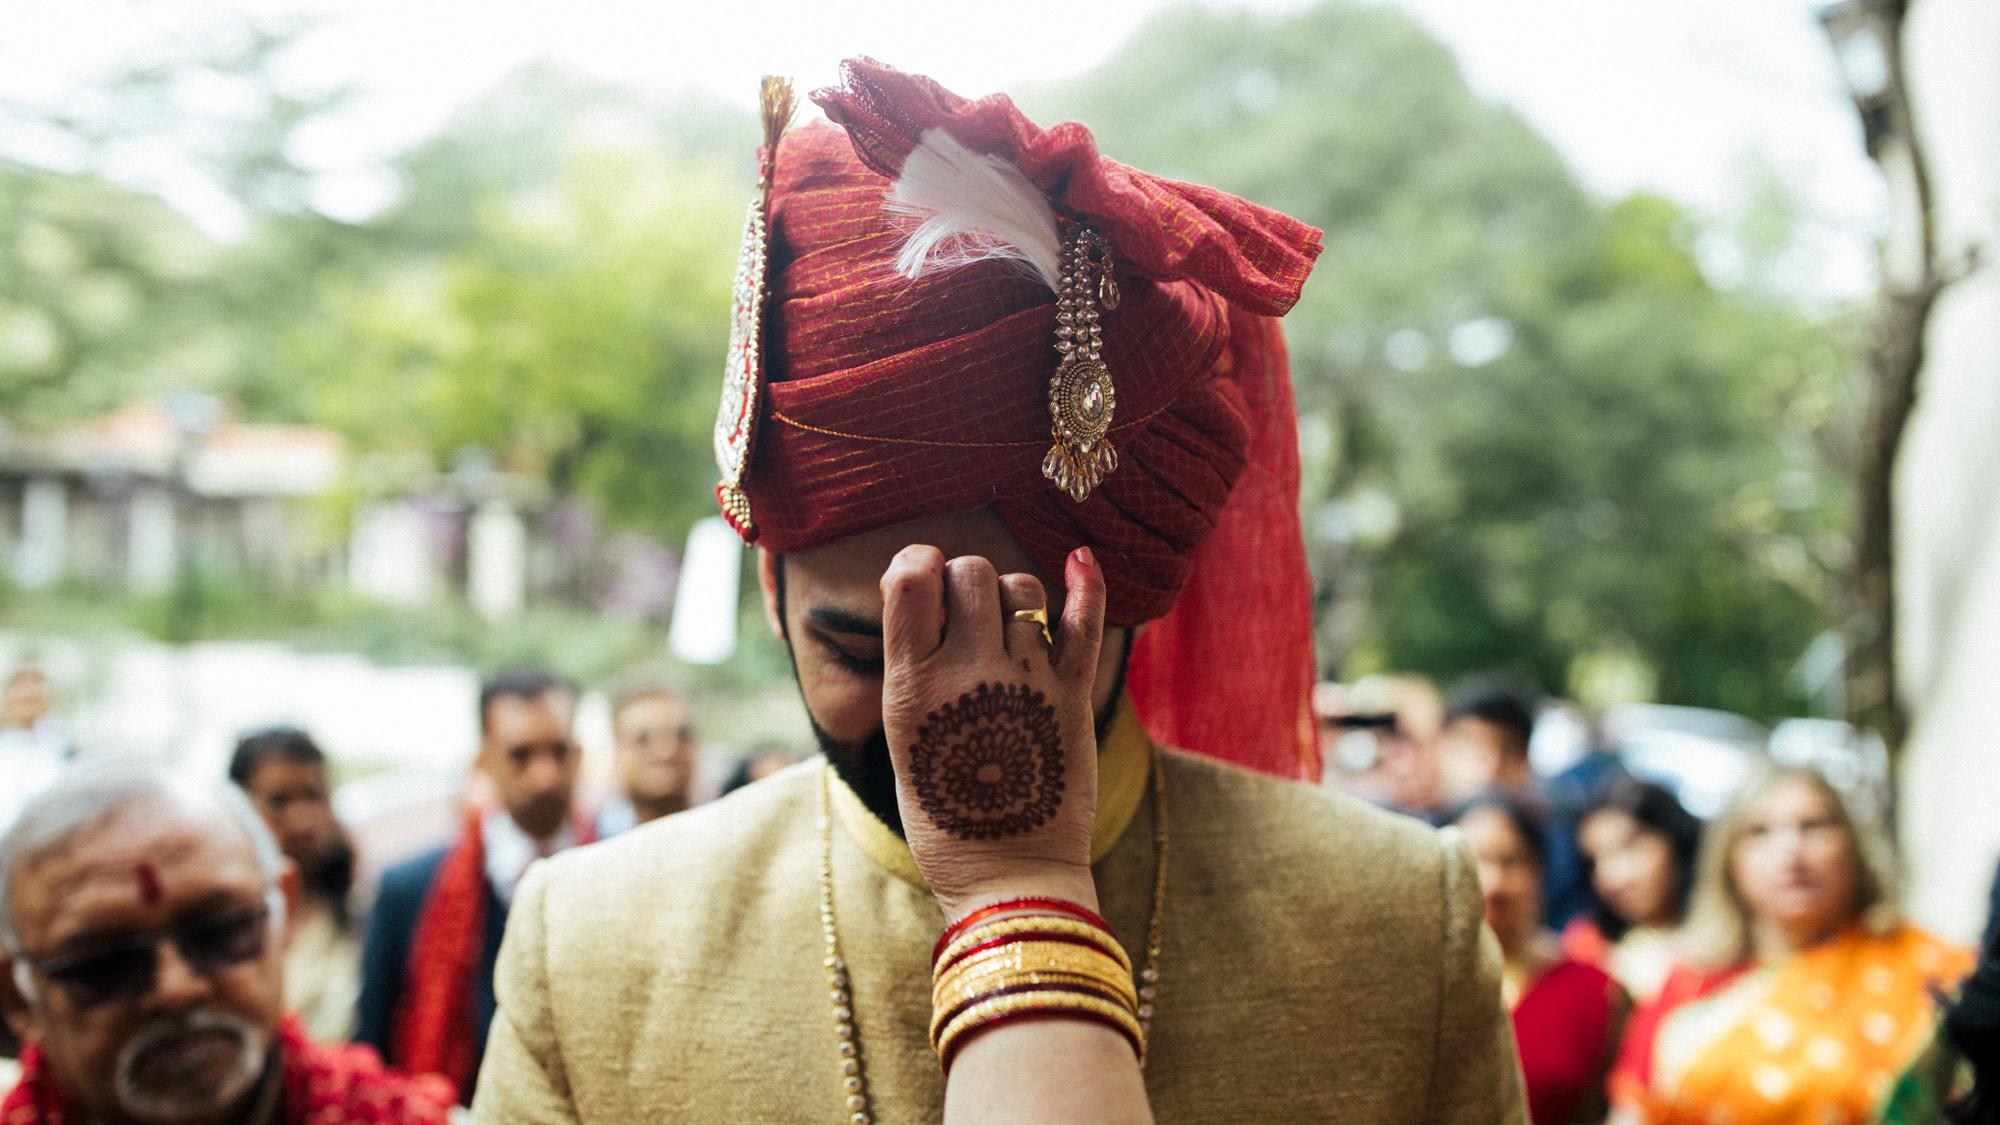 anu_maneesh_alec_vanderboom_Indian_wedding_photography-0081.jpg